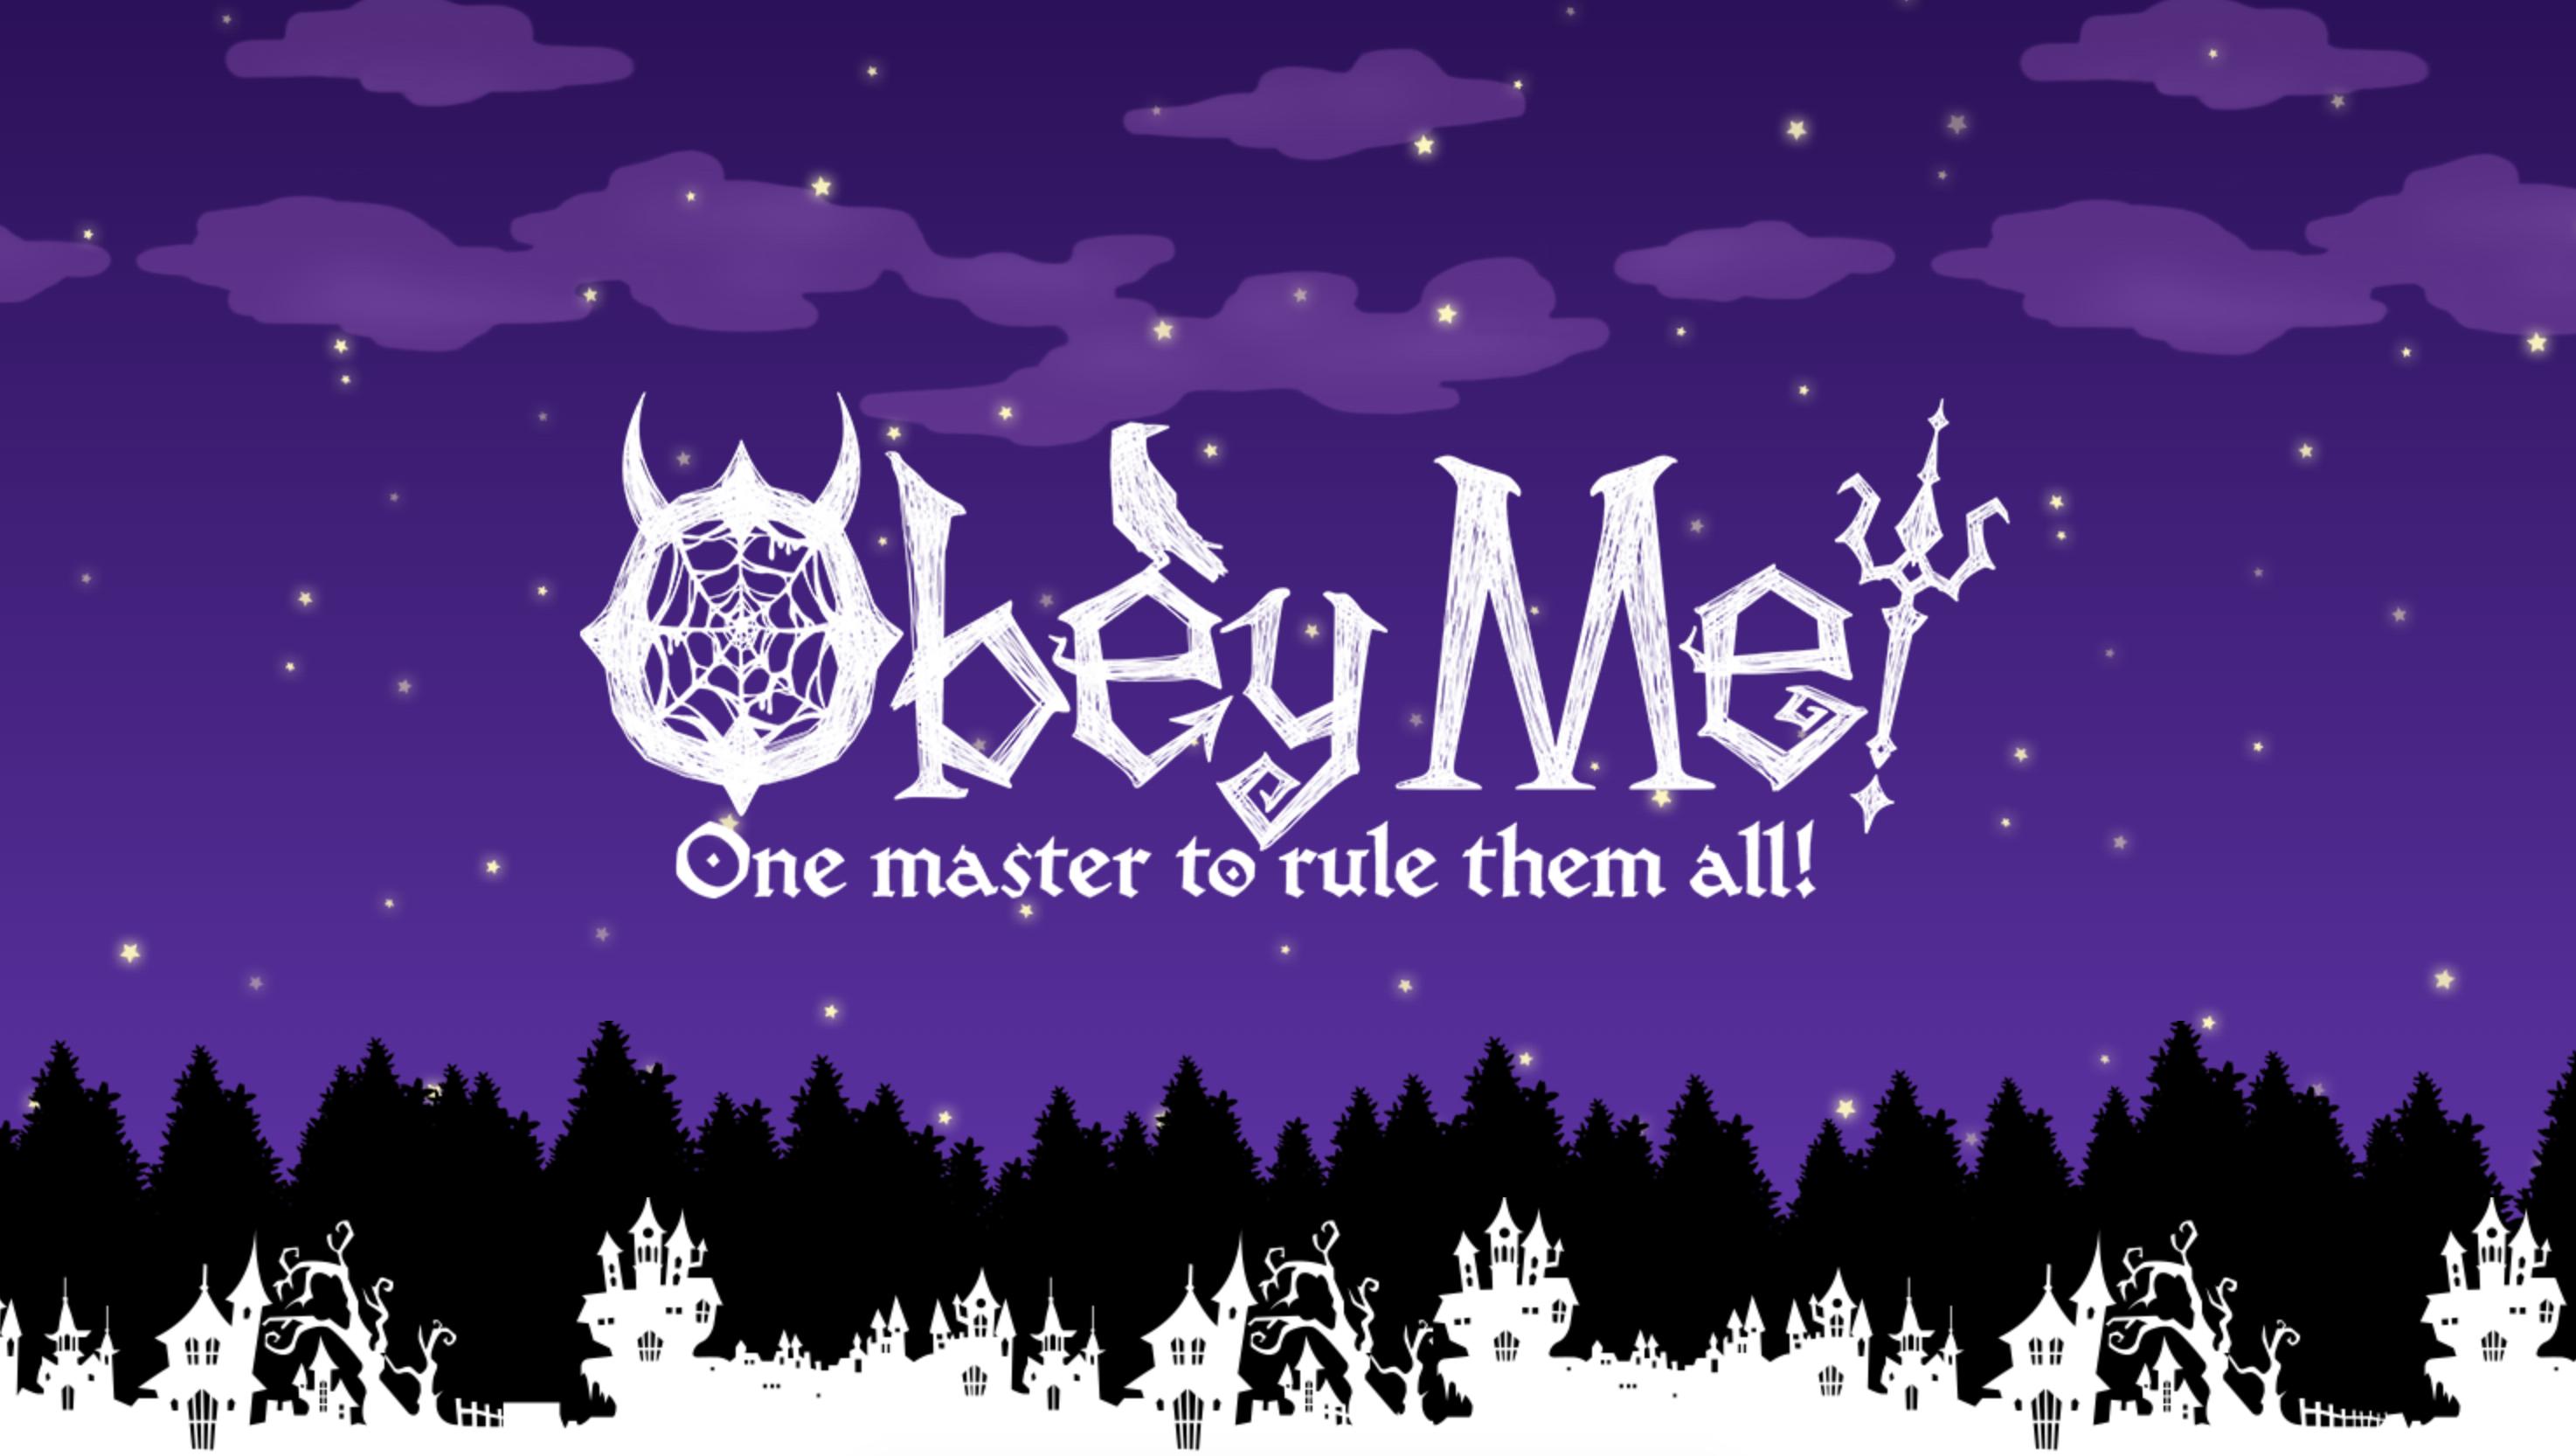 【Obey Me!】配信日・リリース日はいつ?事前登録情報